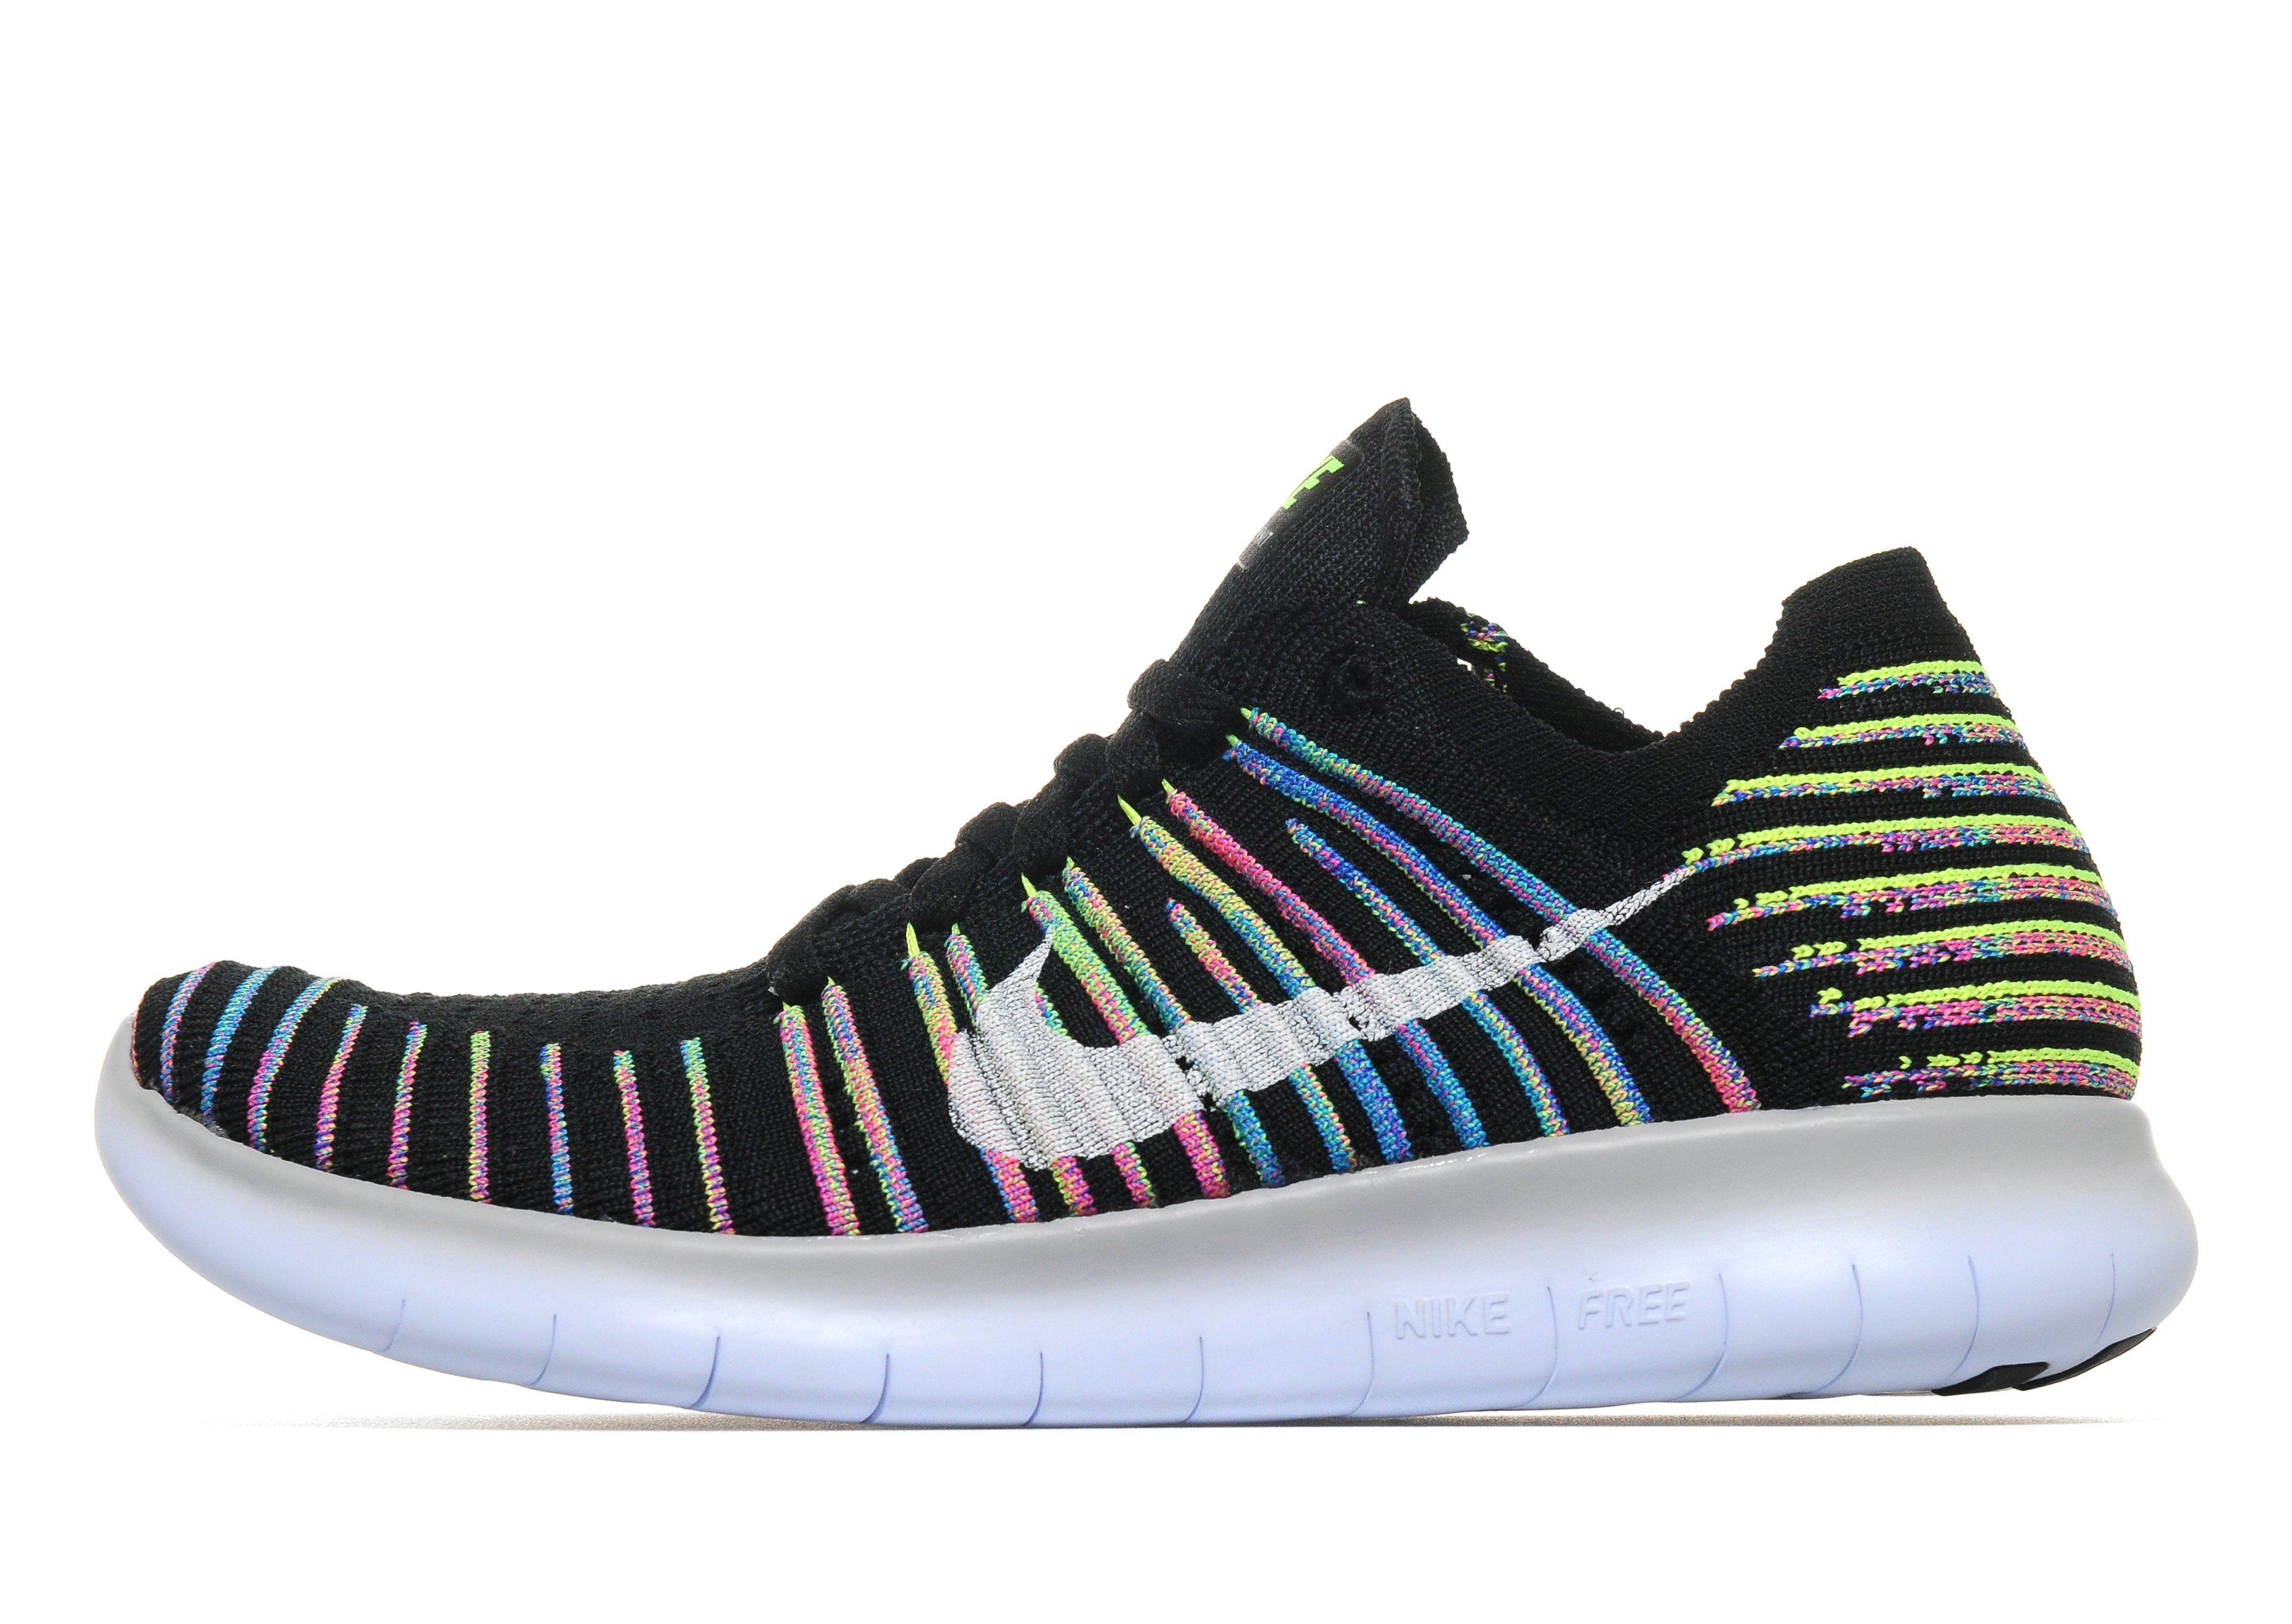 new arrival 65411 a6c2e outlet Nike Free Run Flyknit Women s   JD Sports